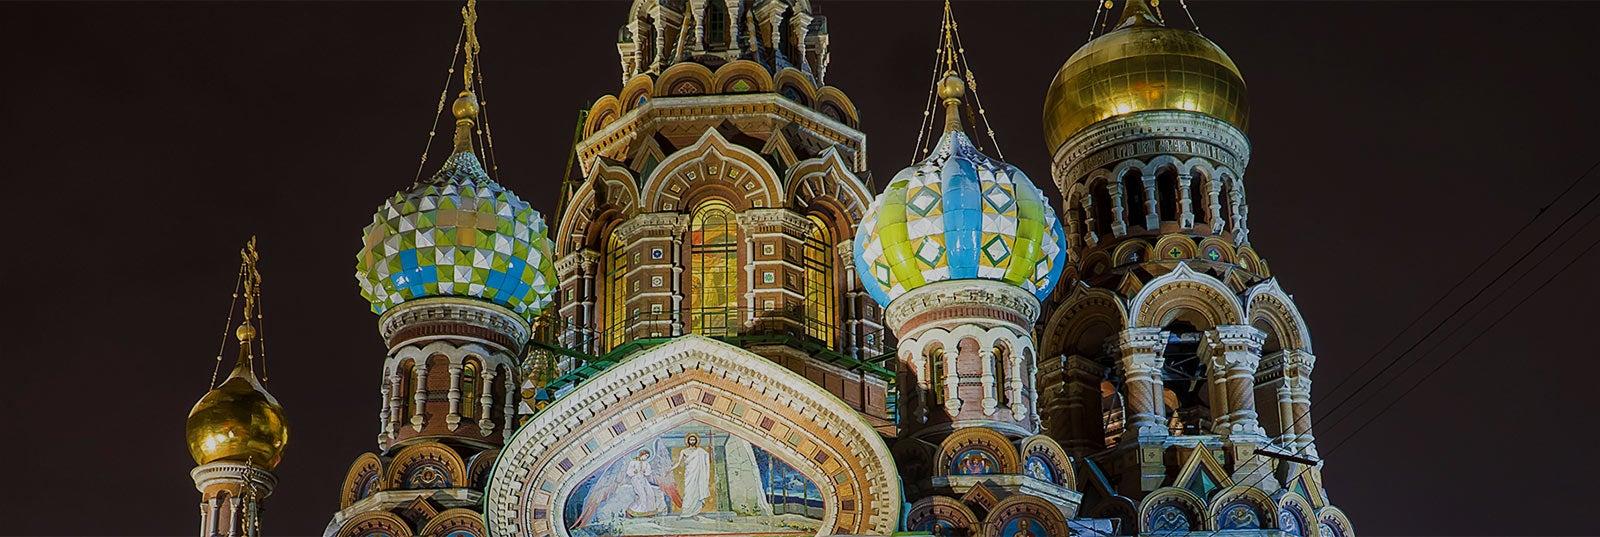 Guía turística de San Pietroburgo